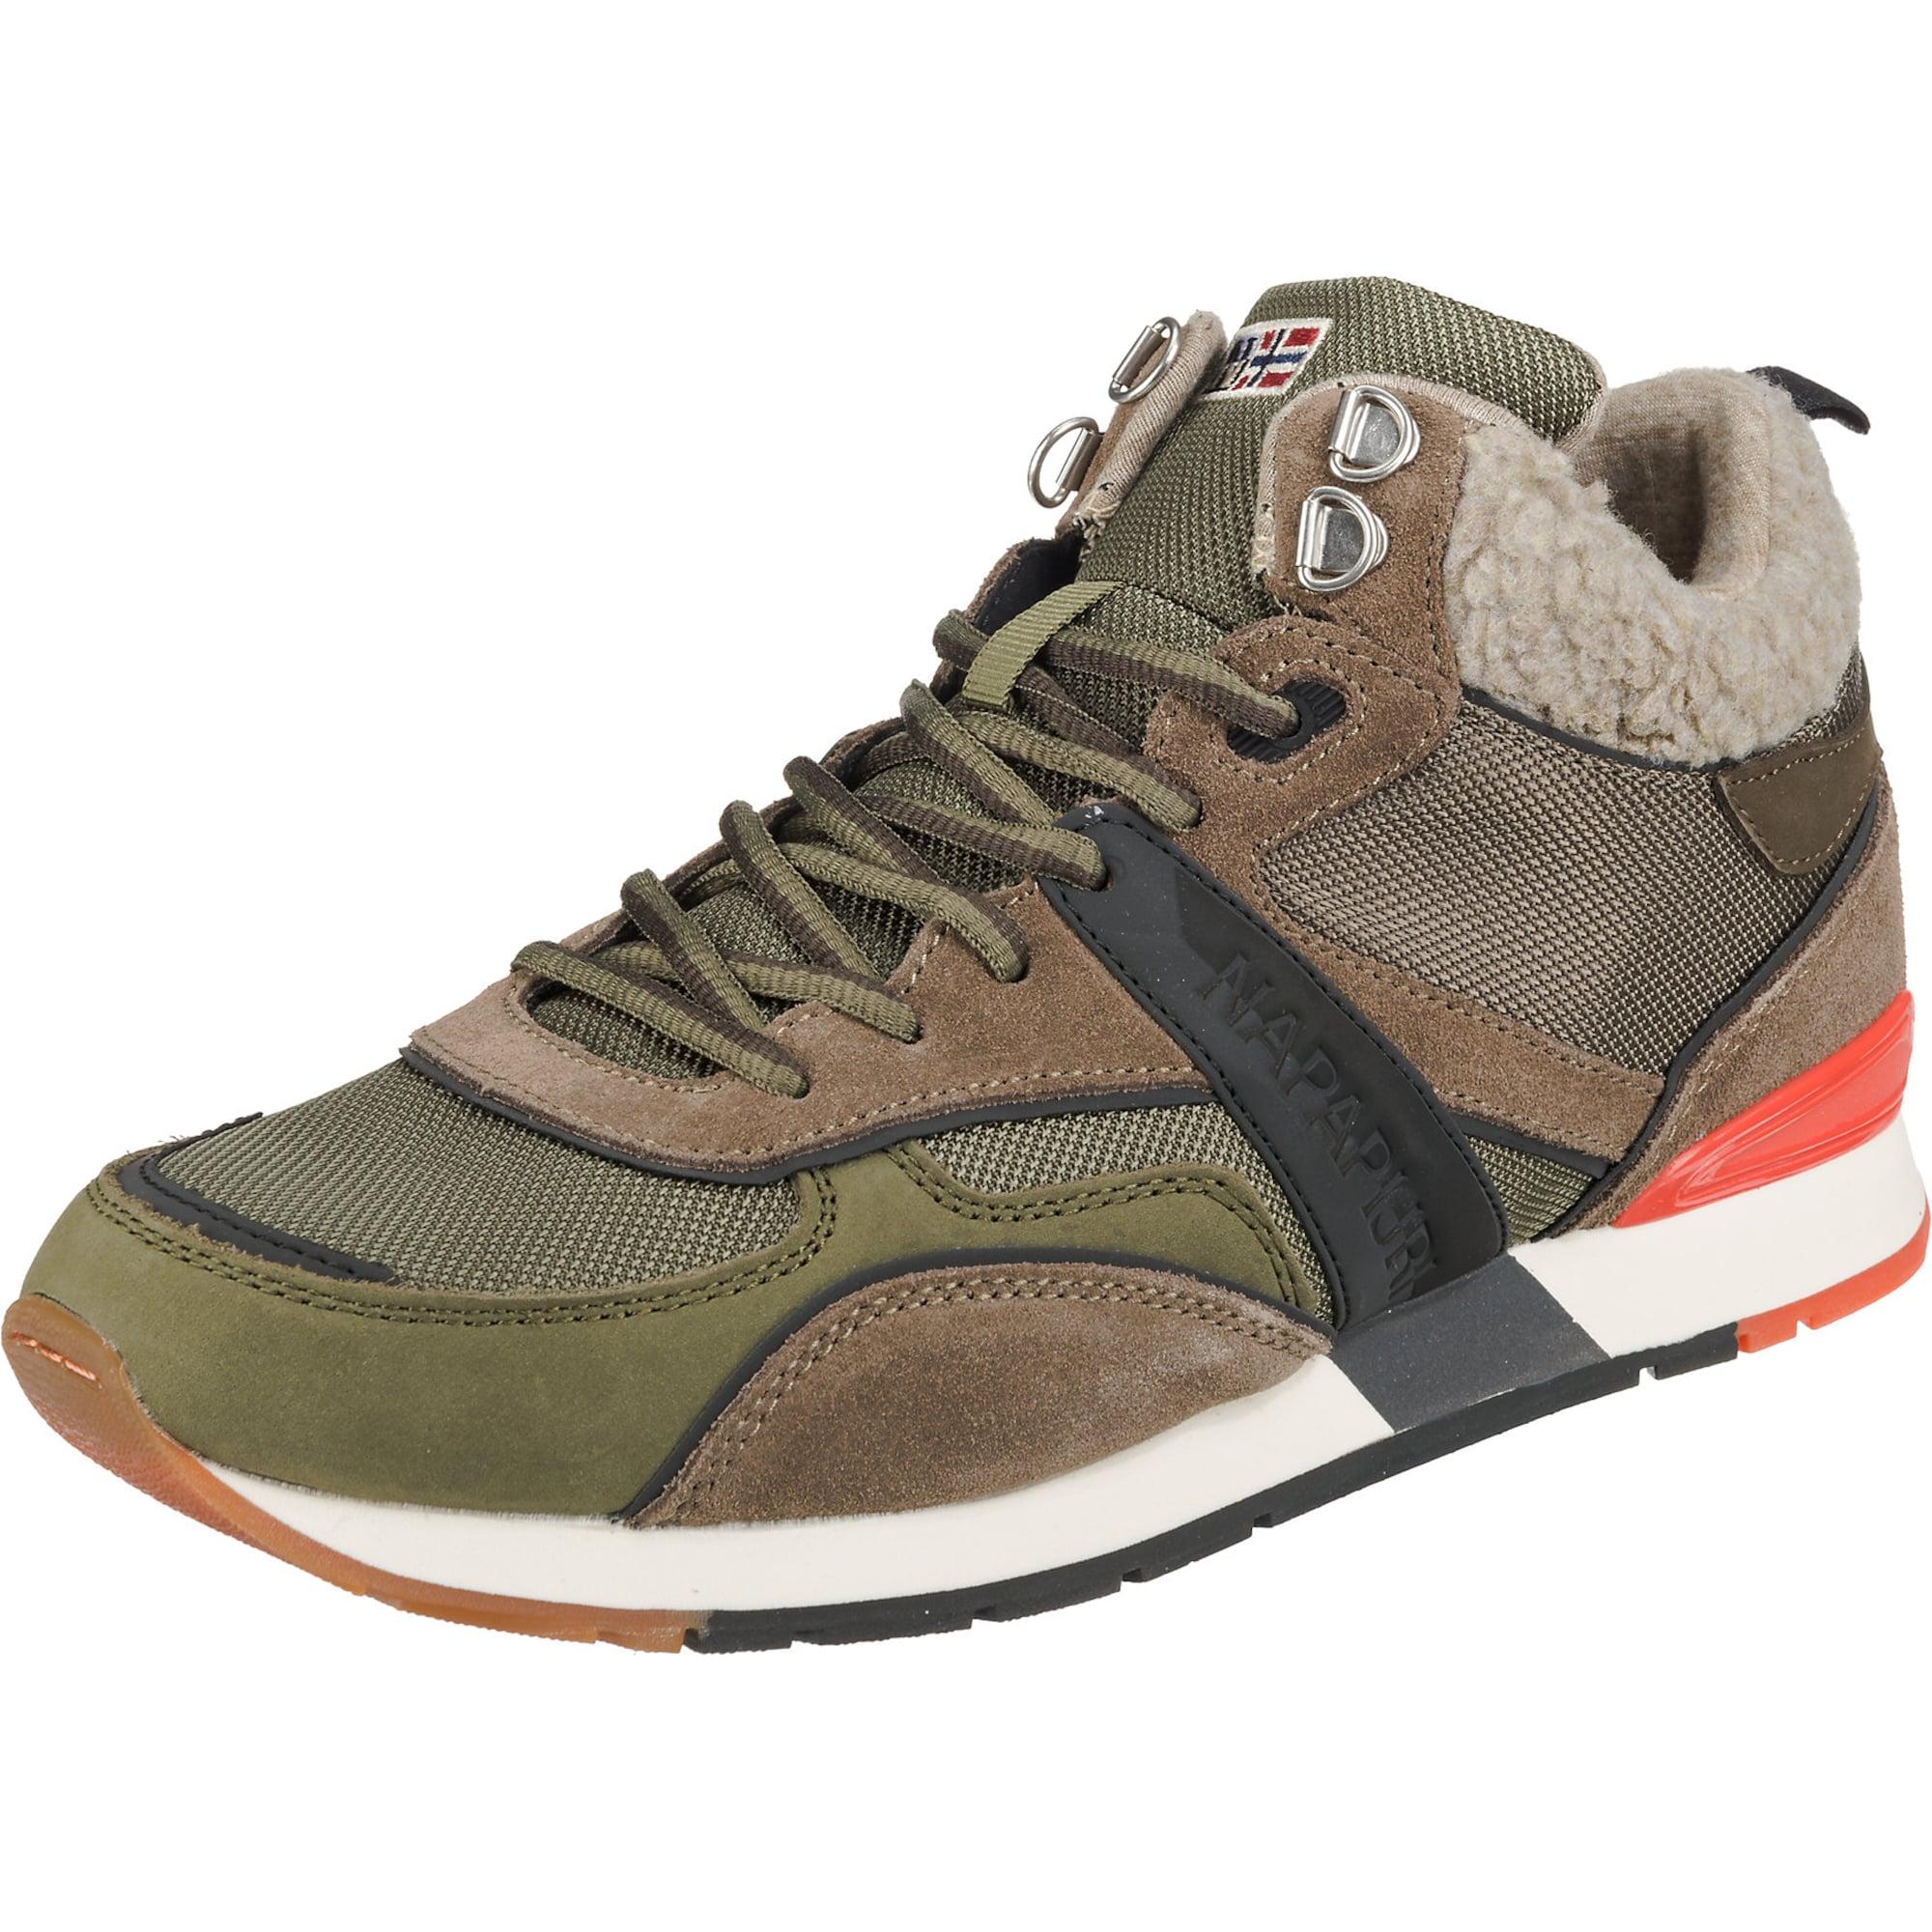 Sneakers High | Schuhe > Sneaker > Sneaker high | Braun - Khaki | NAPAPIJRI